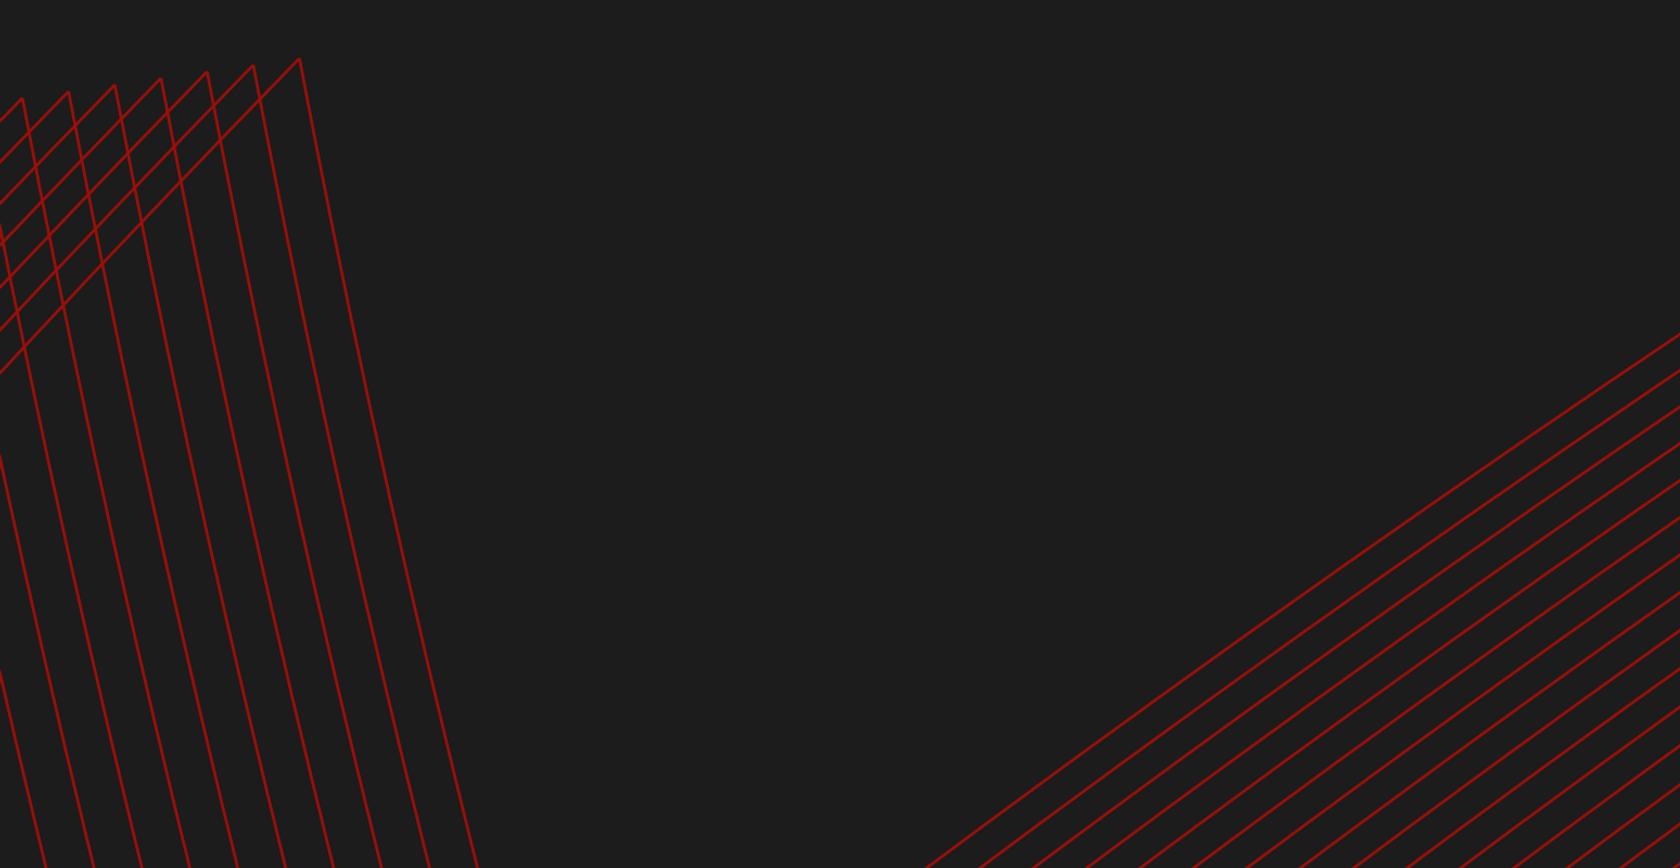 HSBC Sevens Series - Generic Background (Black w/ red stripes)